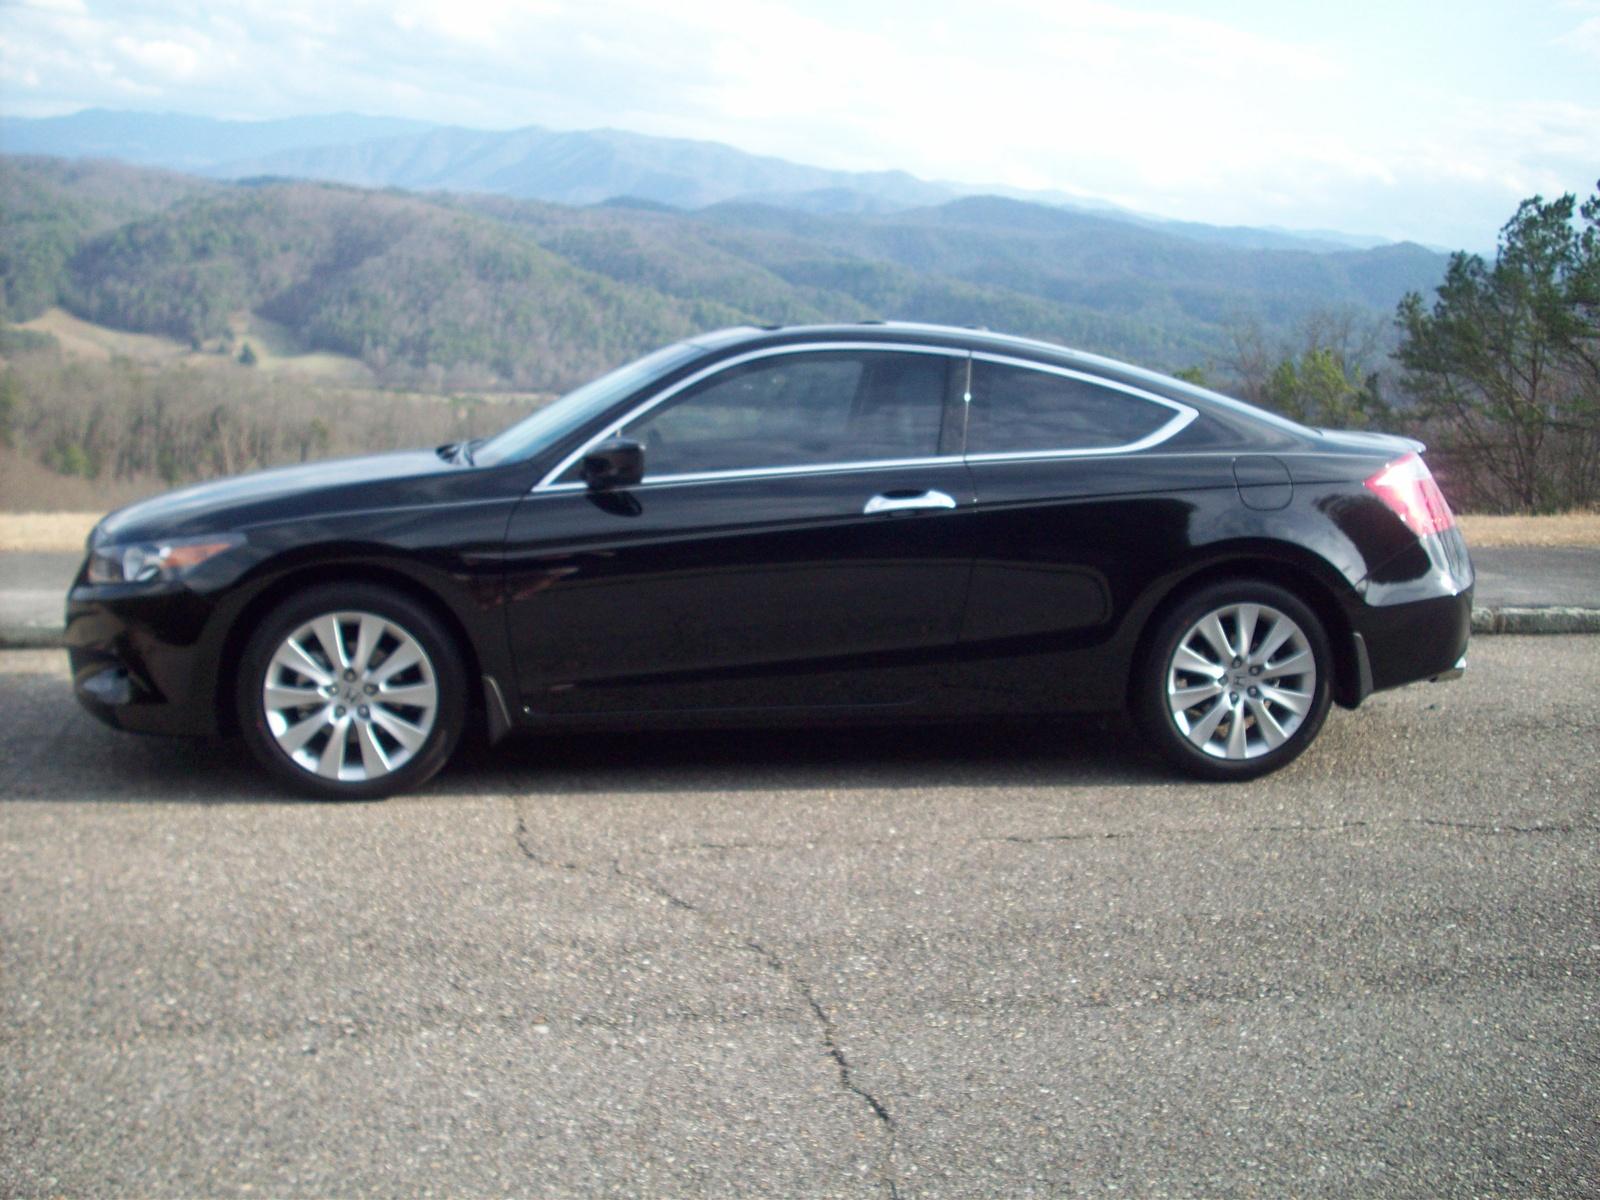 2009 honda accord coupe v6 hp. Black Bedroom Furniture Sets. Home Design Ideas